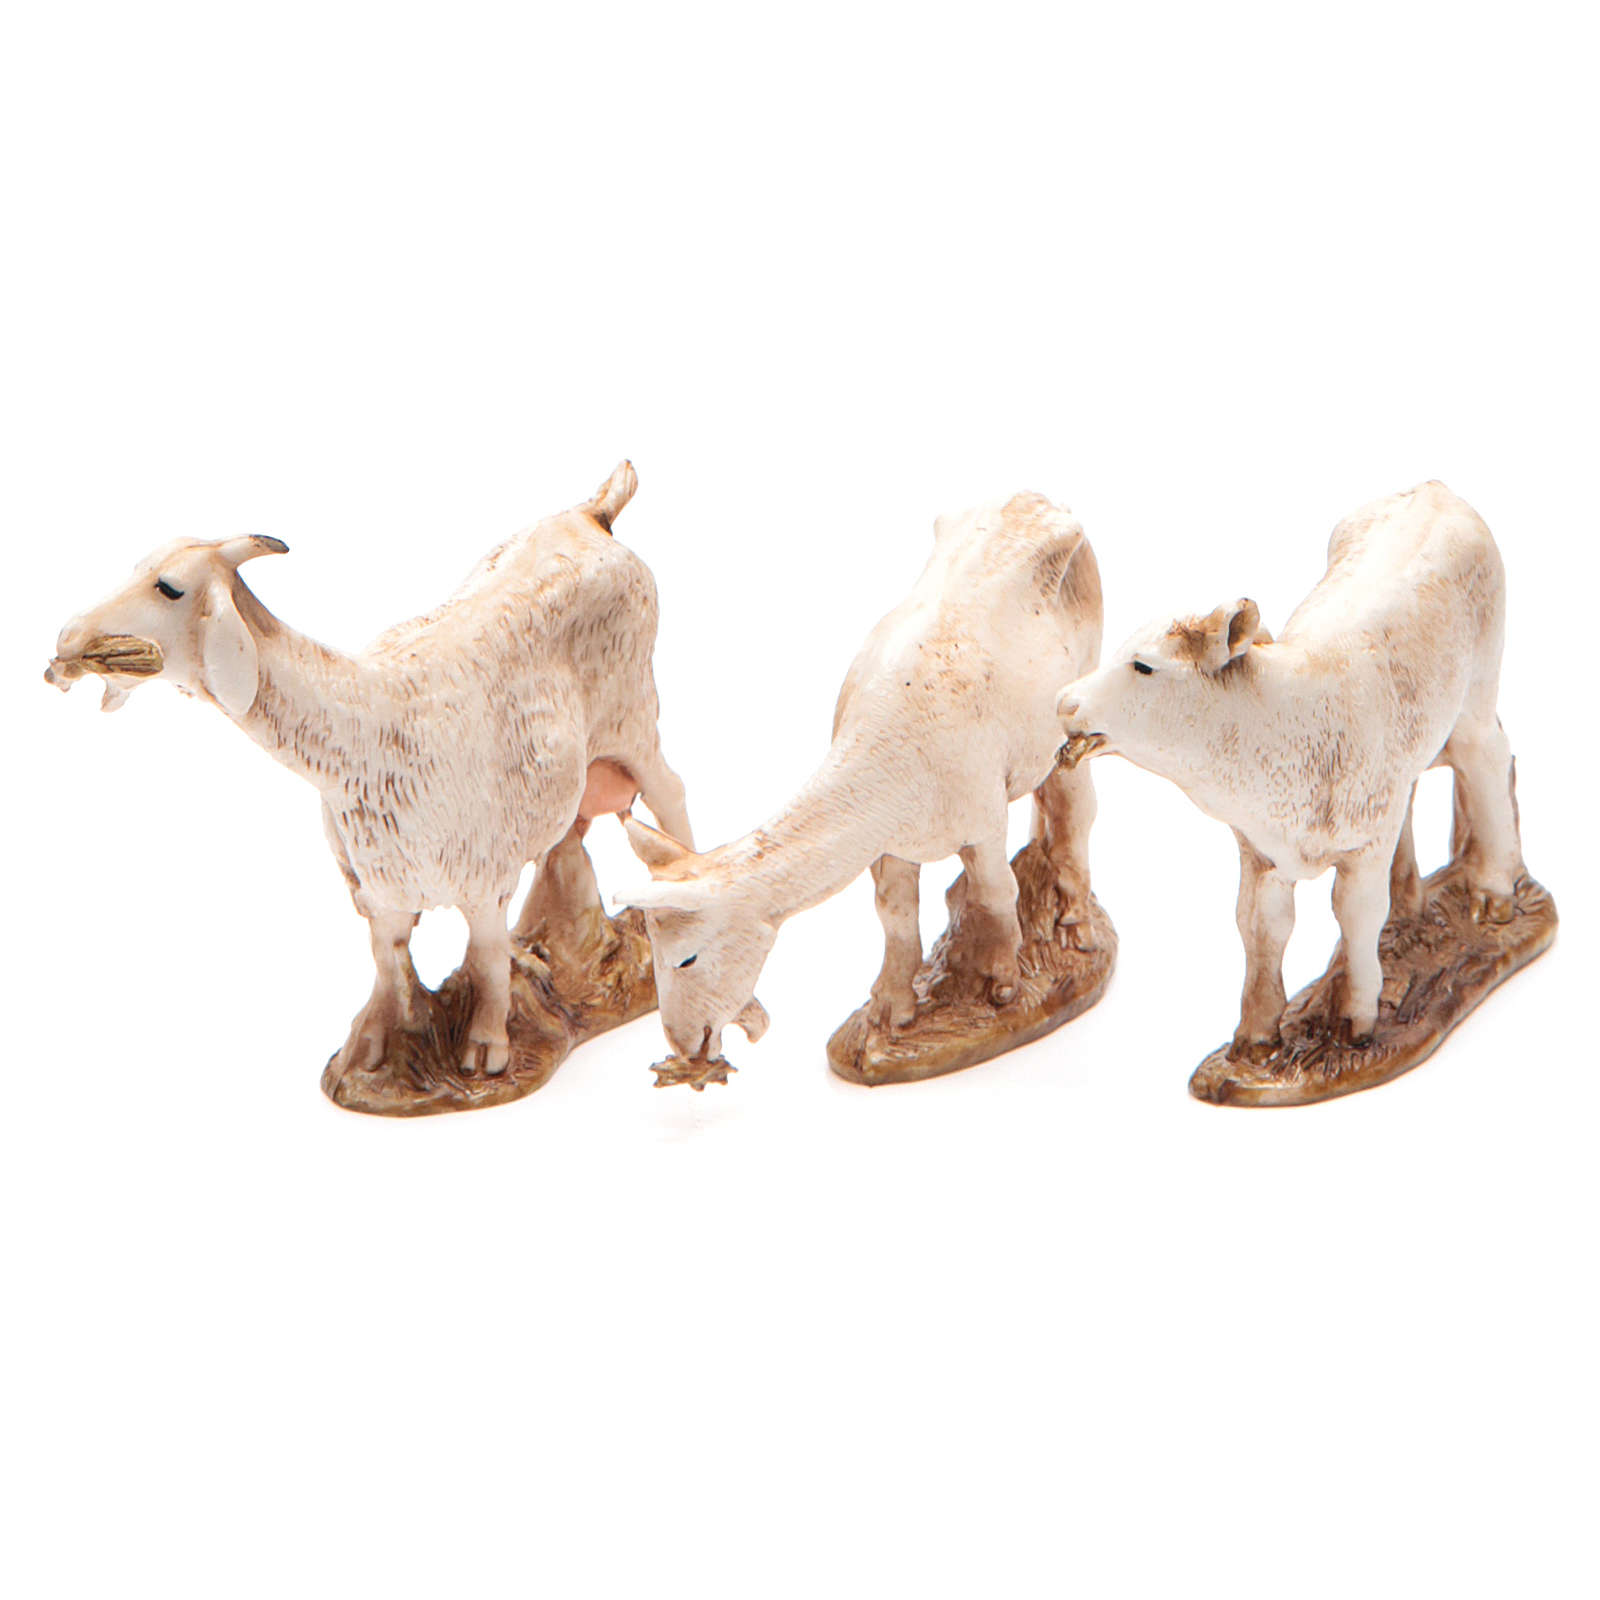 Animales varios 10 cm belén Moranduzzo 3 figuras 4